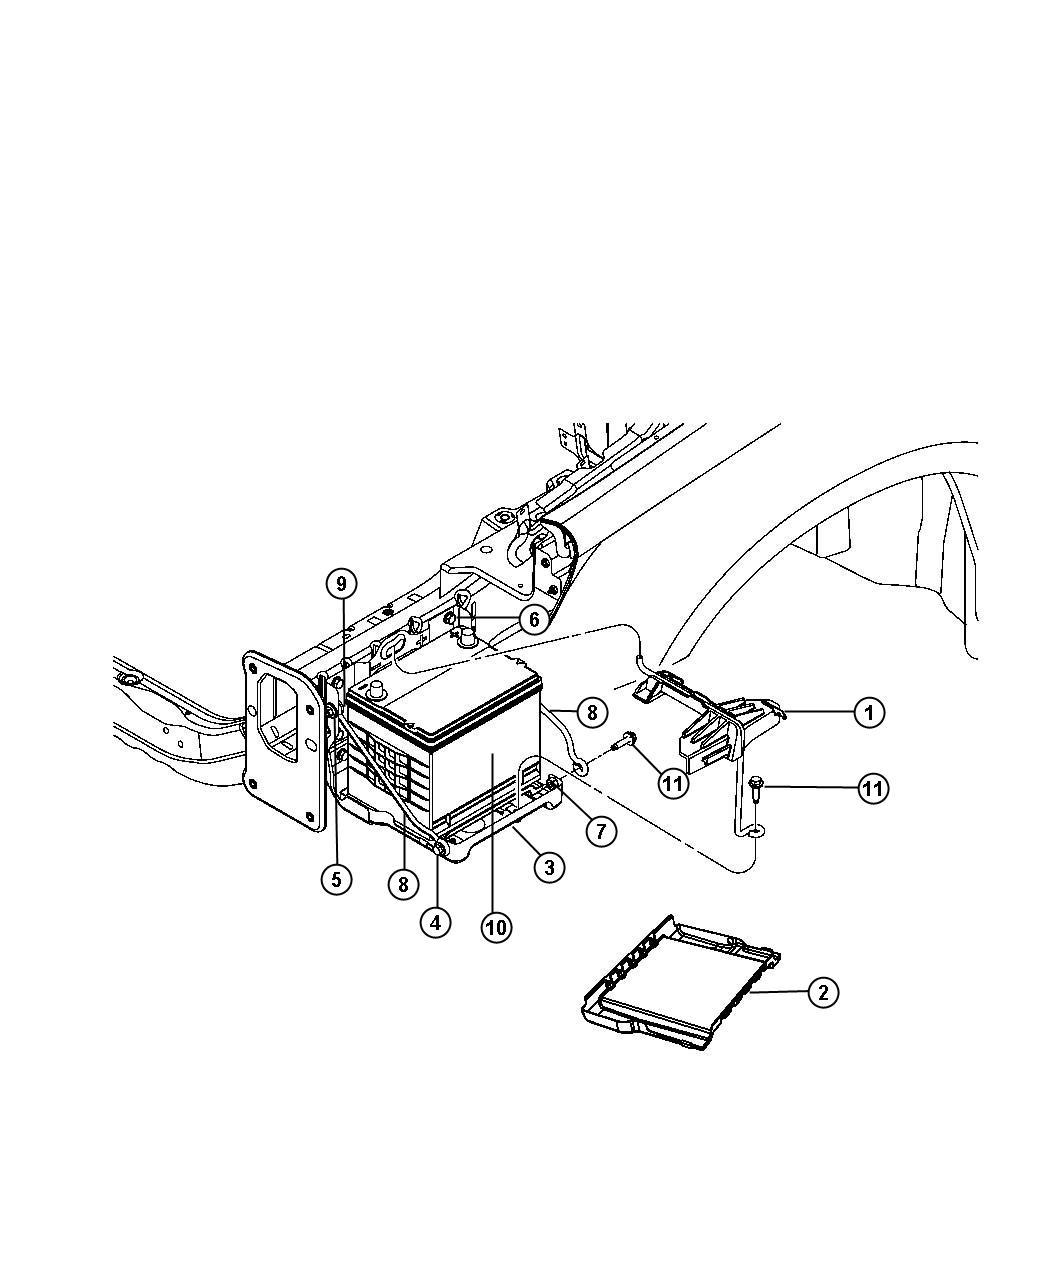 battery wiring diagram besides dodge trailer plug wiring diagram on